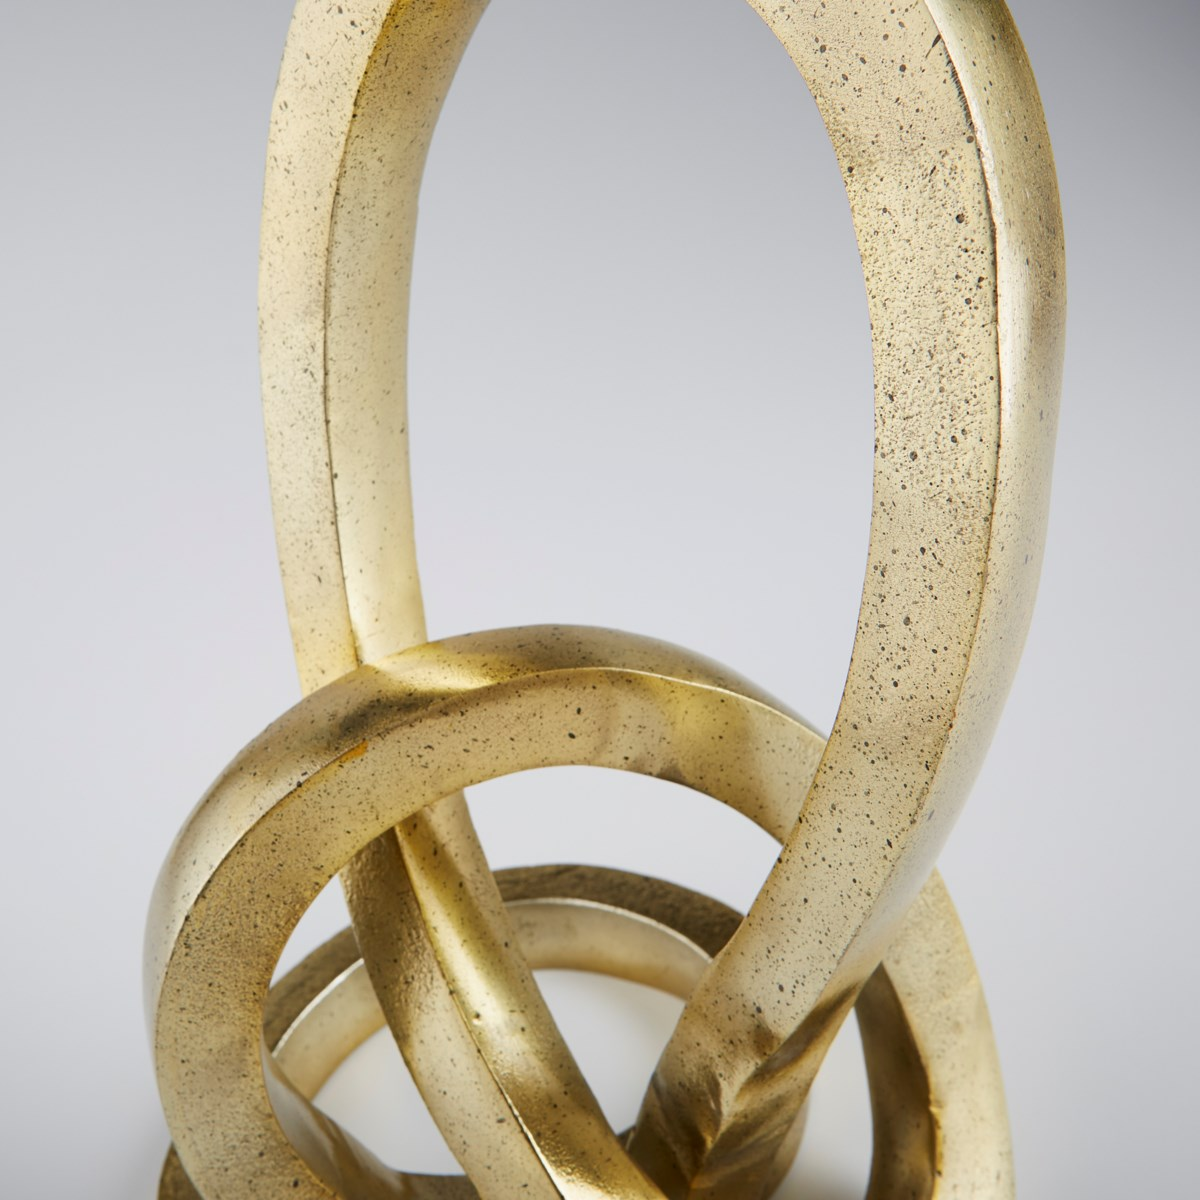 Meridian Sculpture Designed for Cyan Design by J. Kent Martin